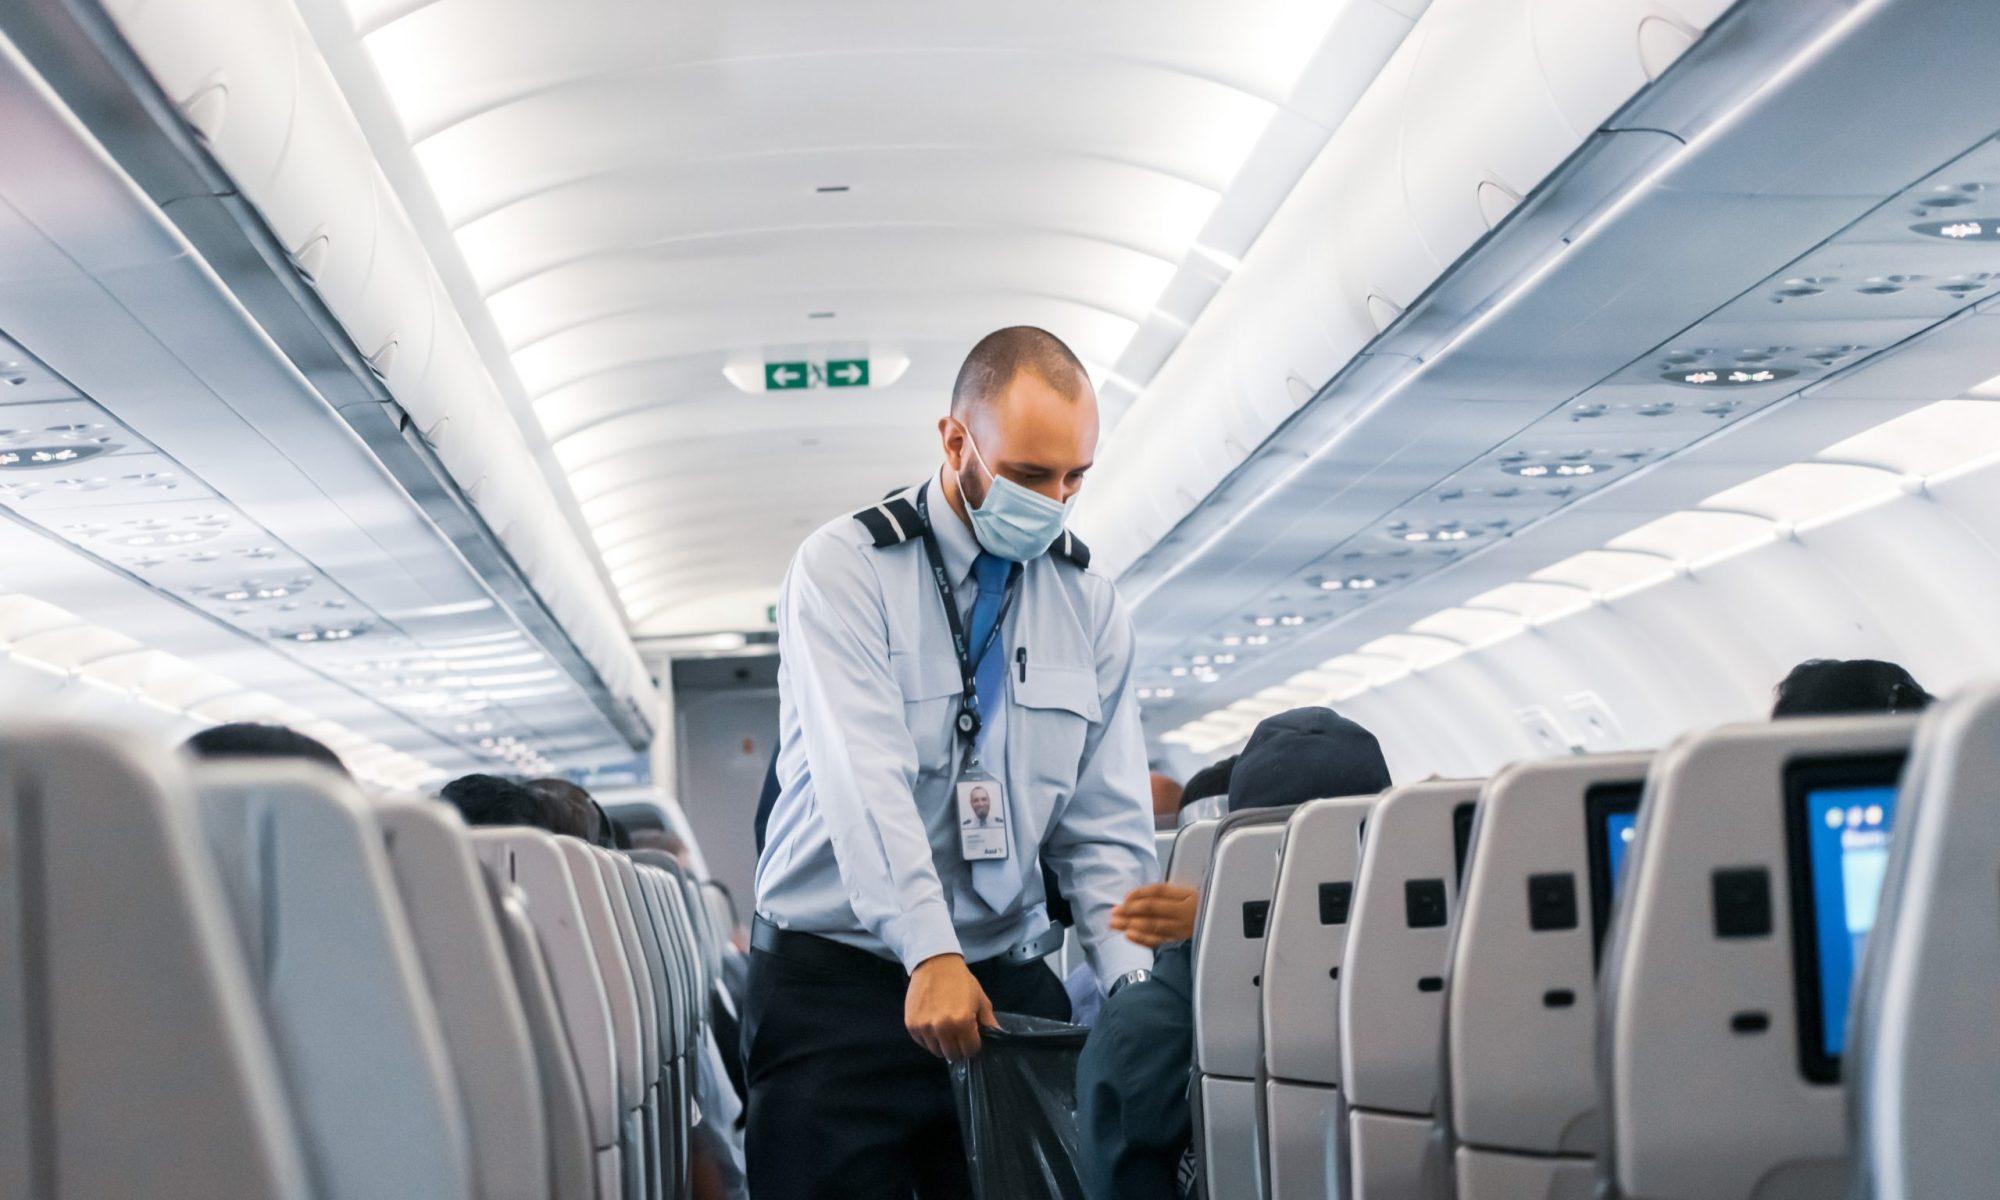 Flight attendant in cabin